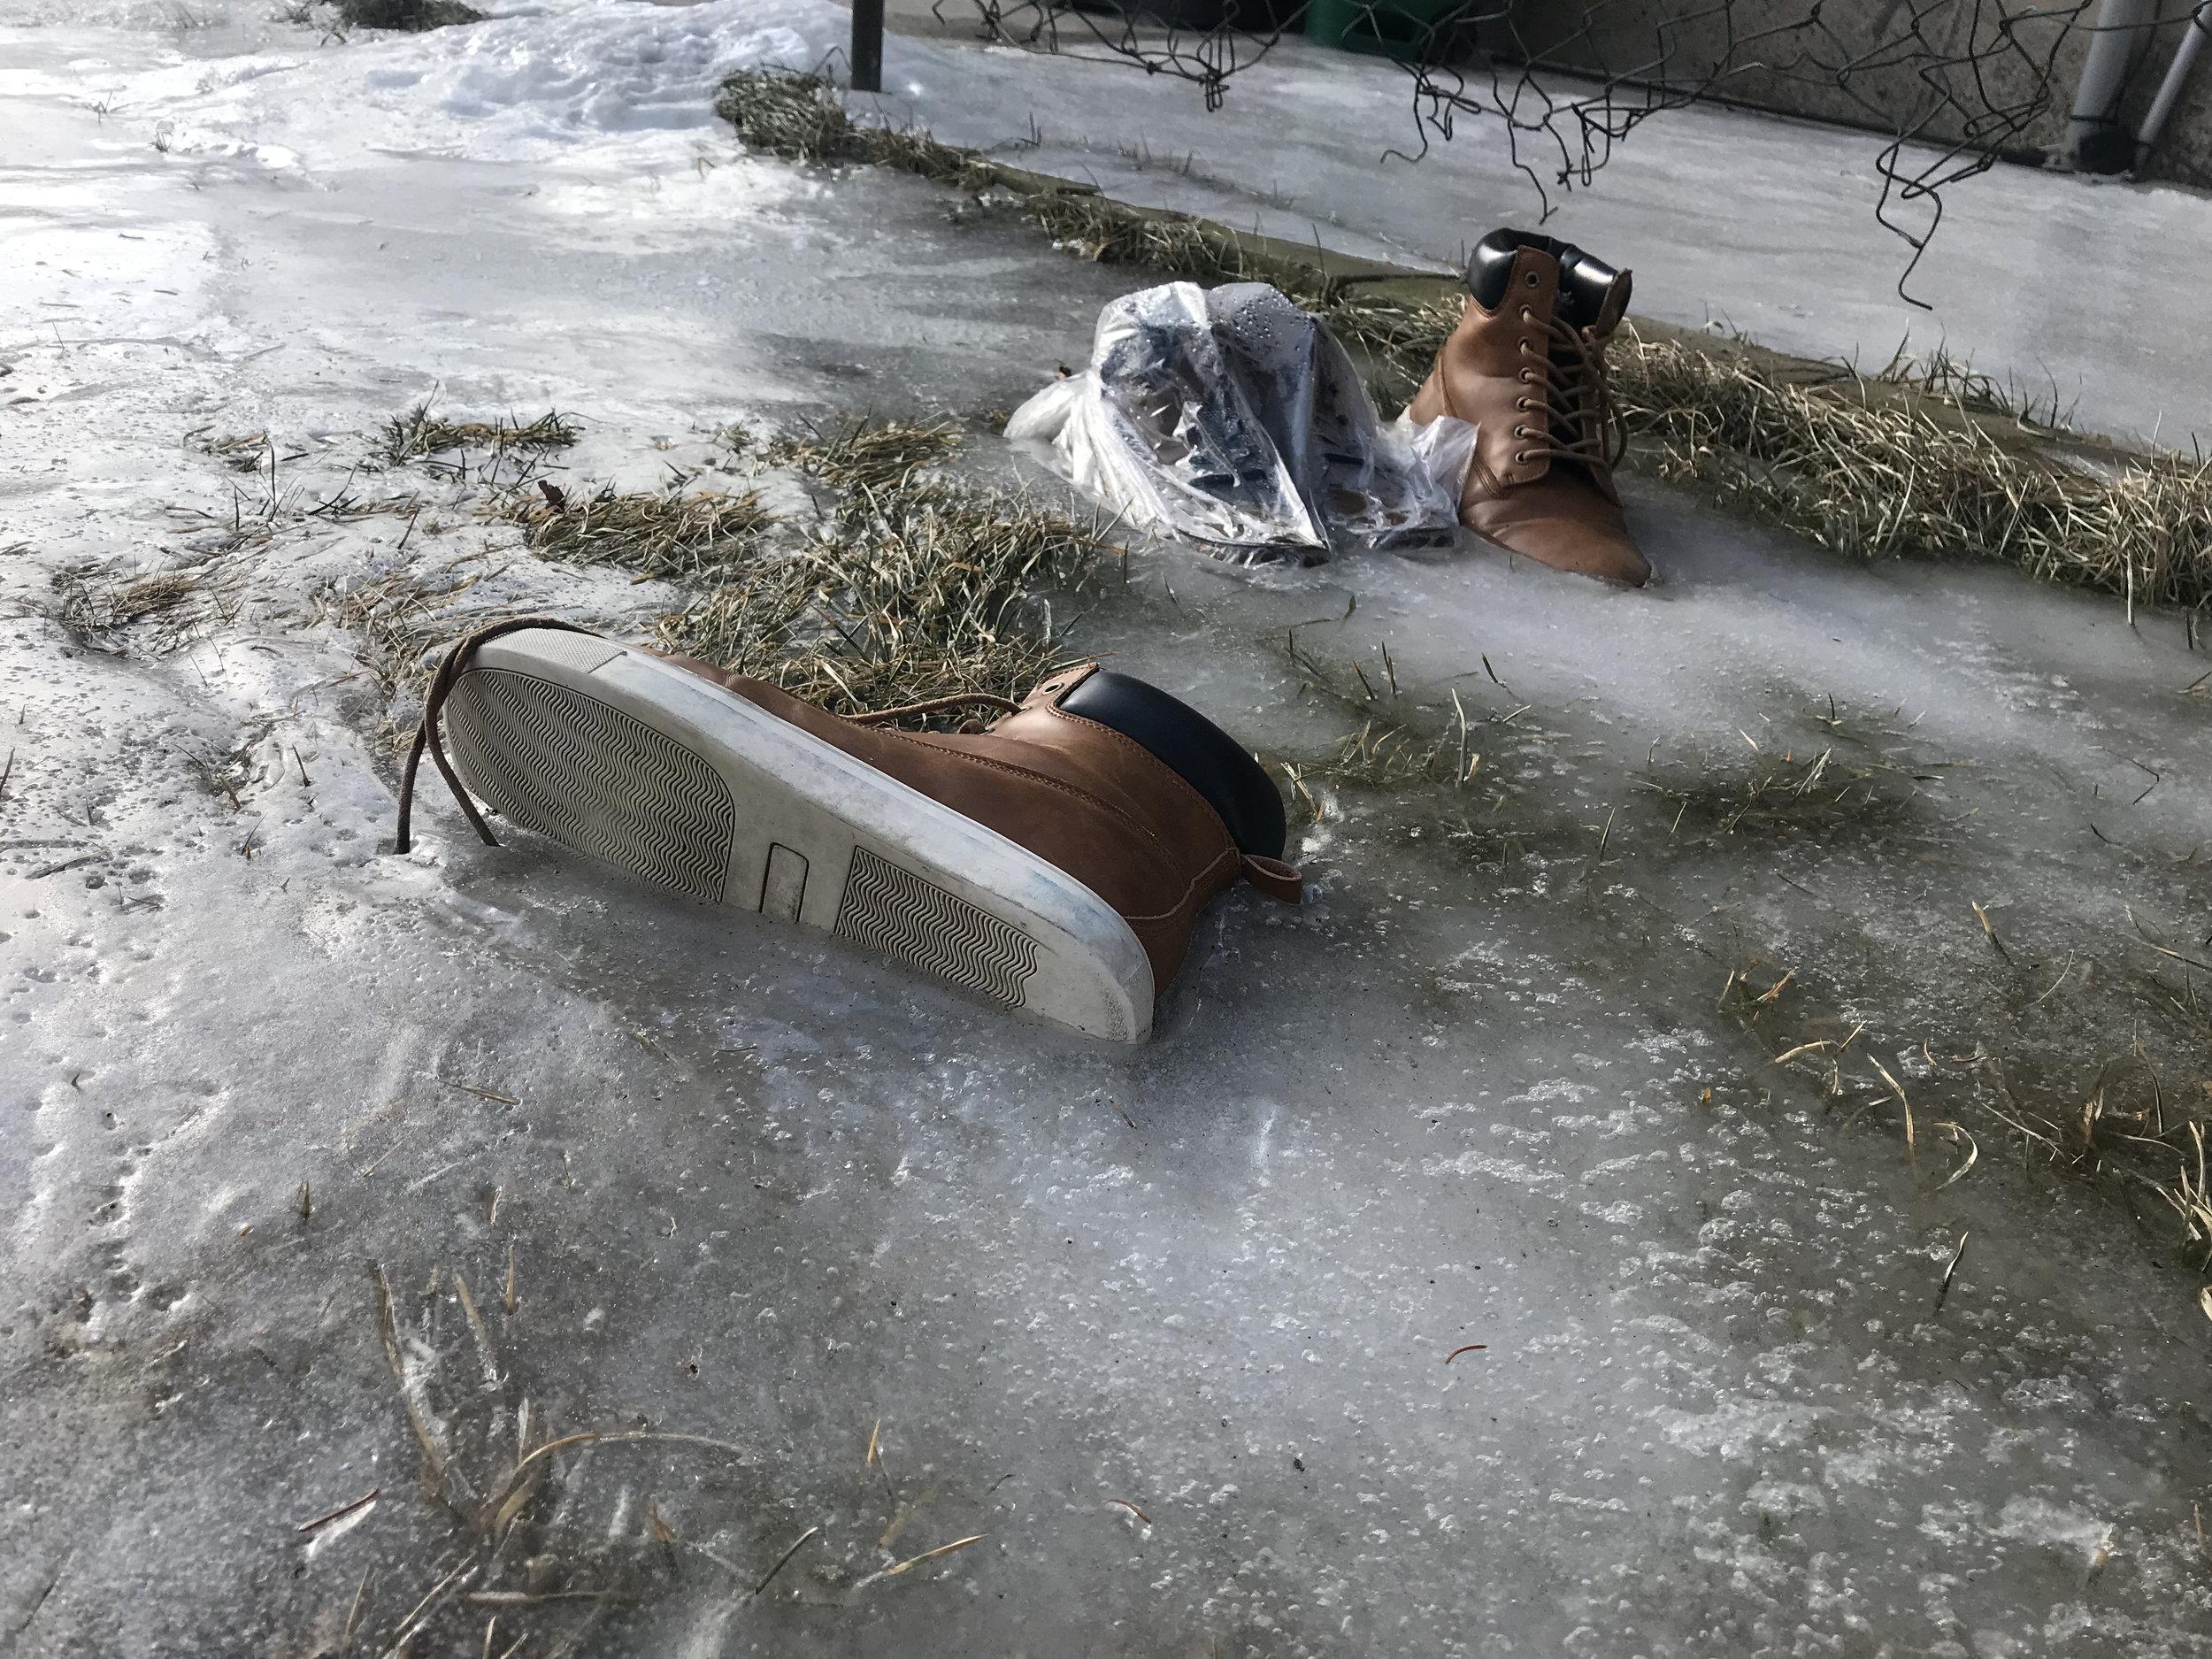 Footwear emerging from winter hibernation